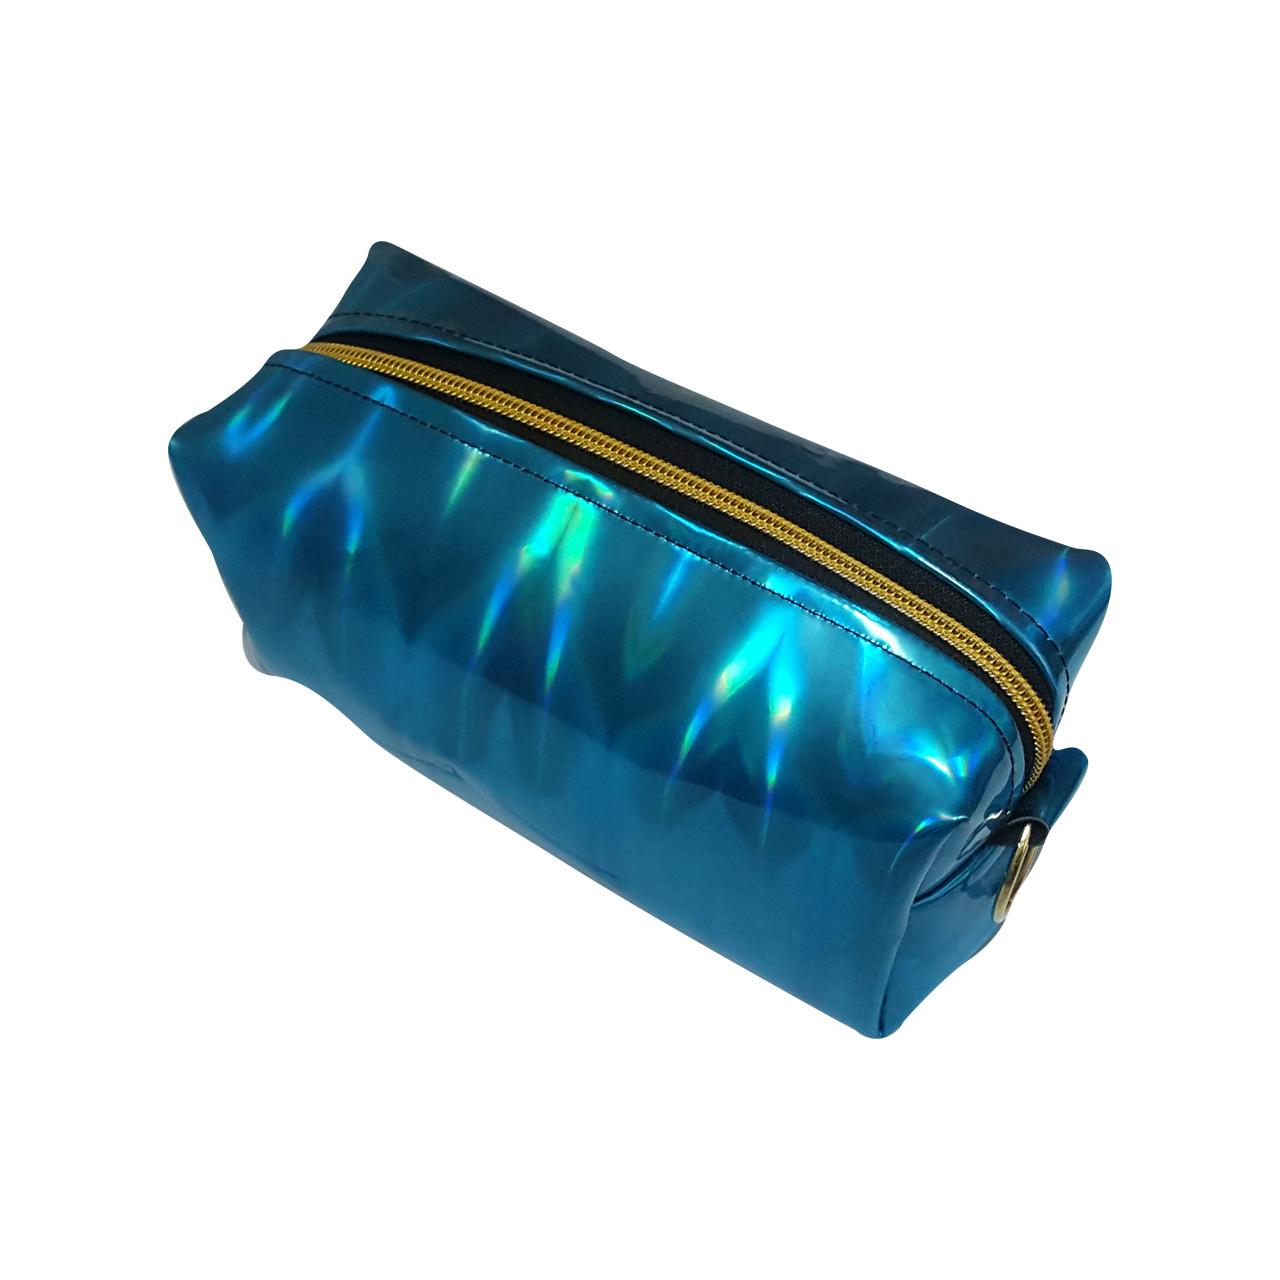 کیف  لوازم  آرایش زنانه کد U300